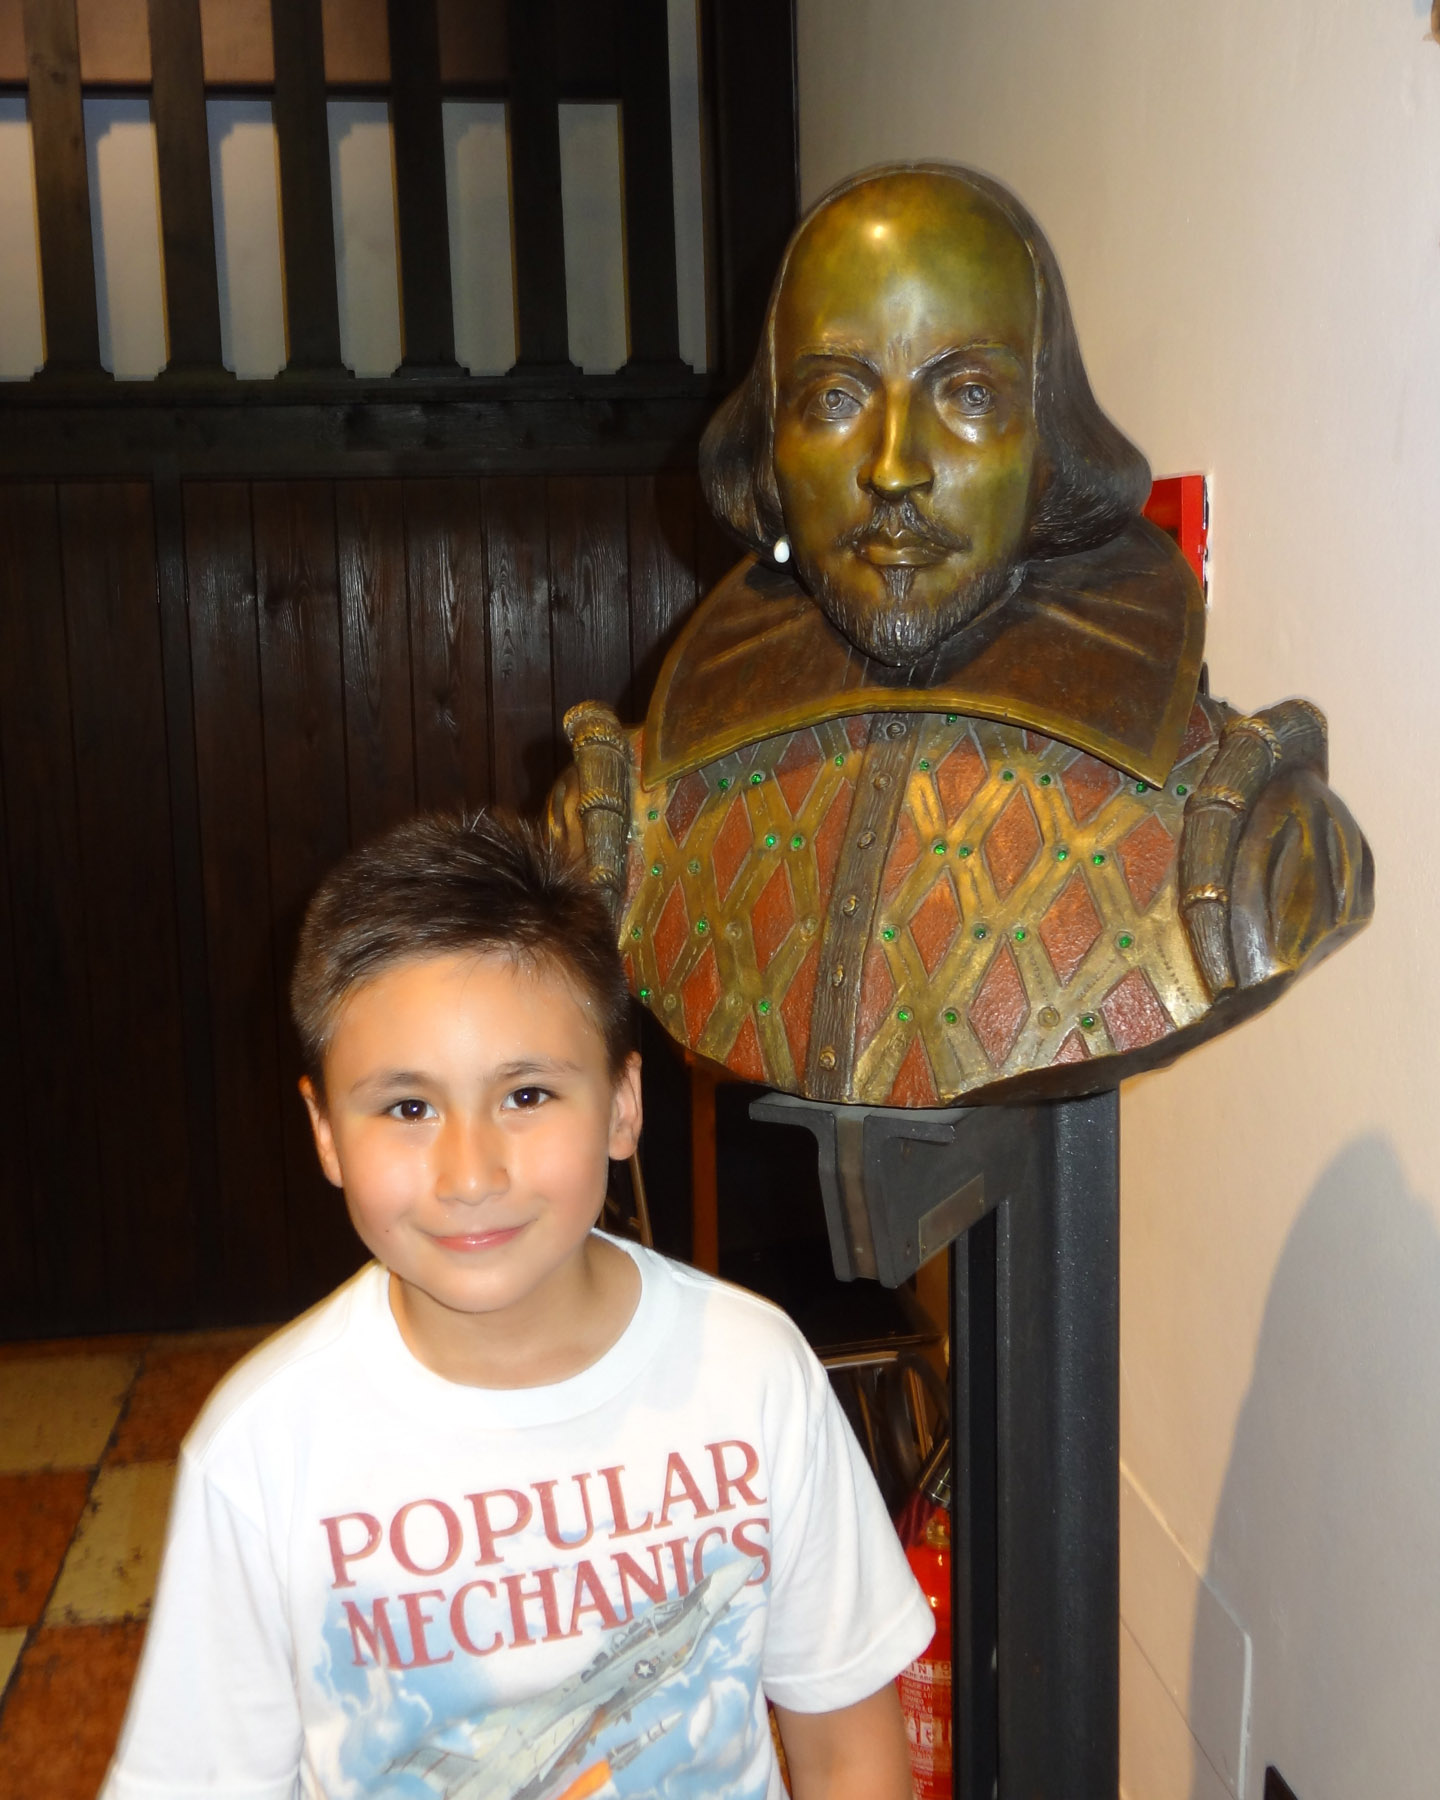 Shakespeare Statue, n° 23 of Via Cappello, Verona, Italy 2015